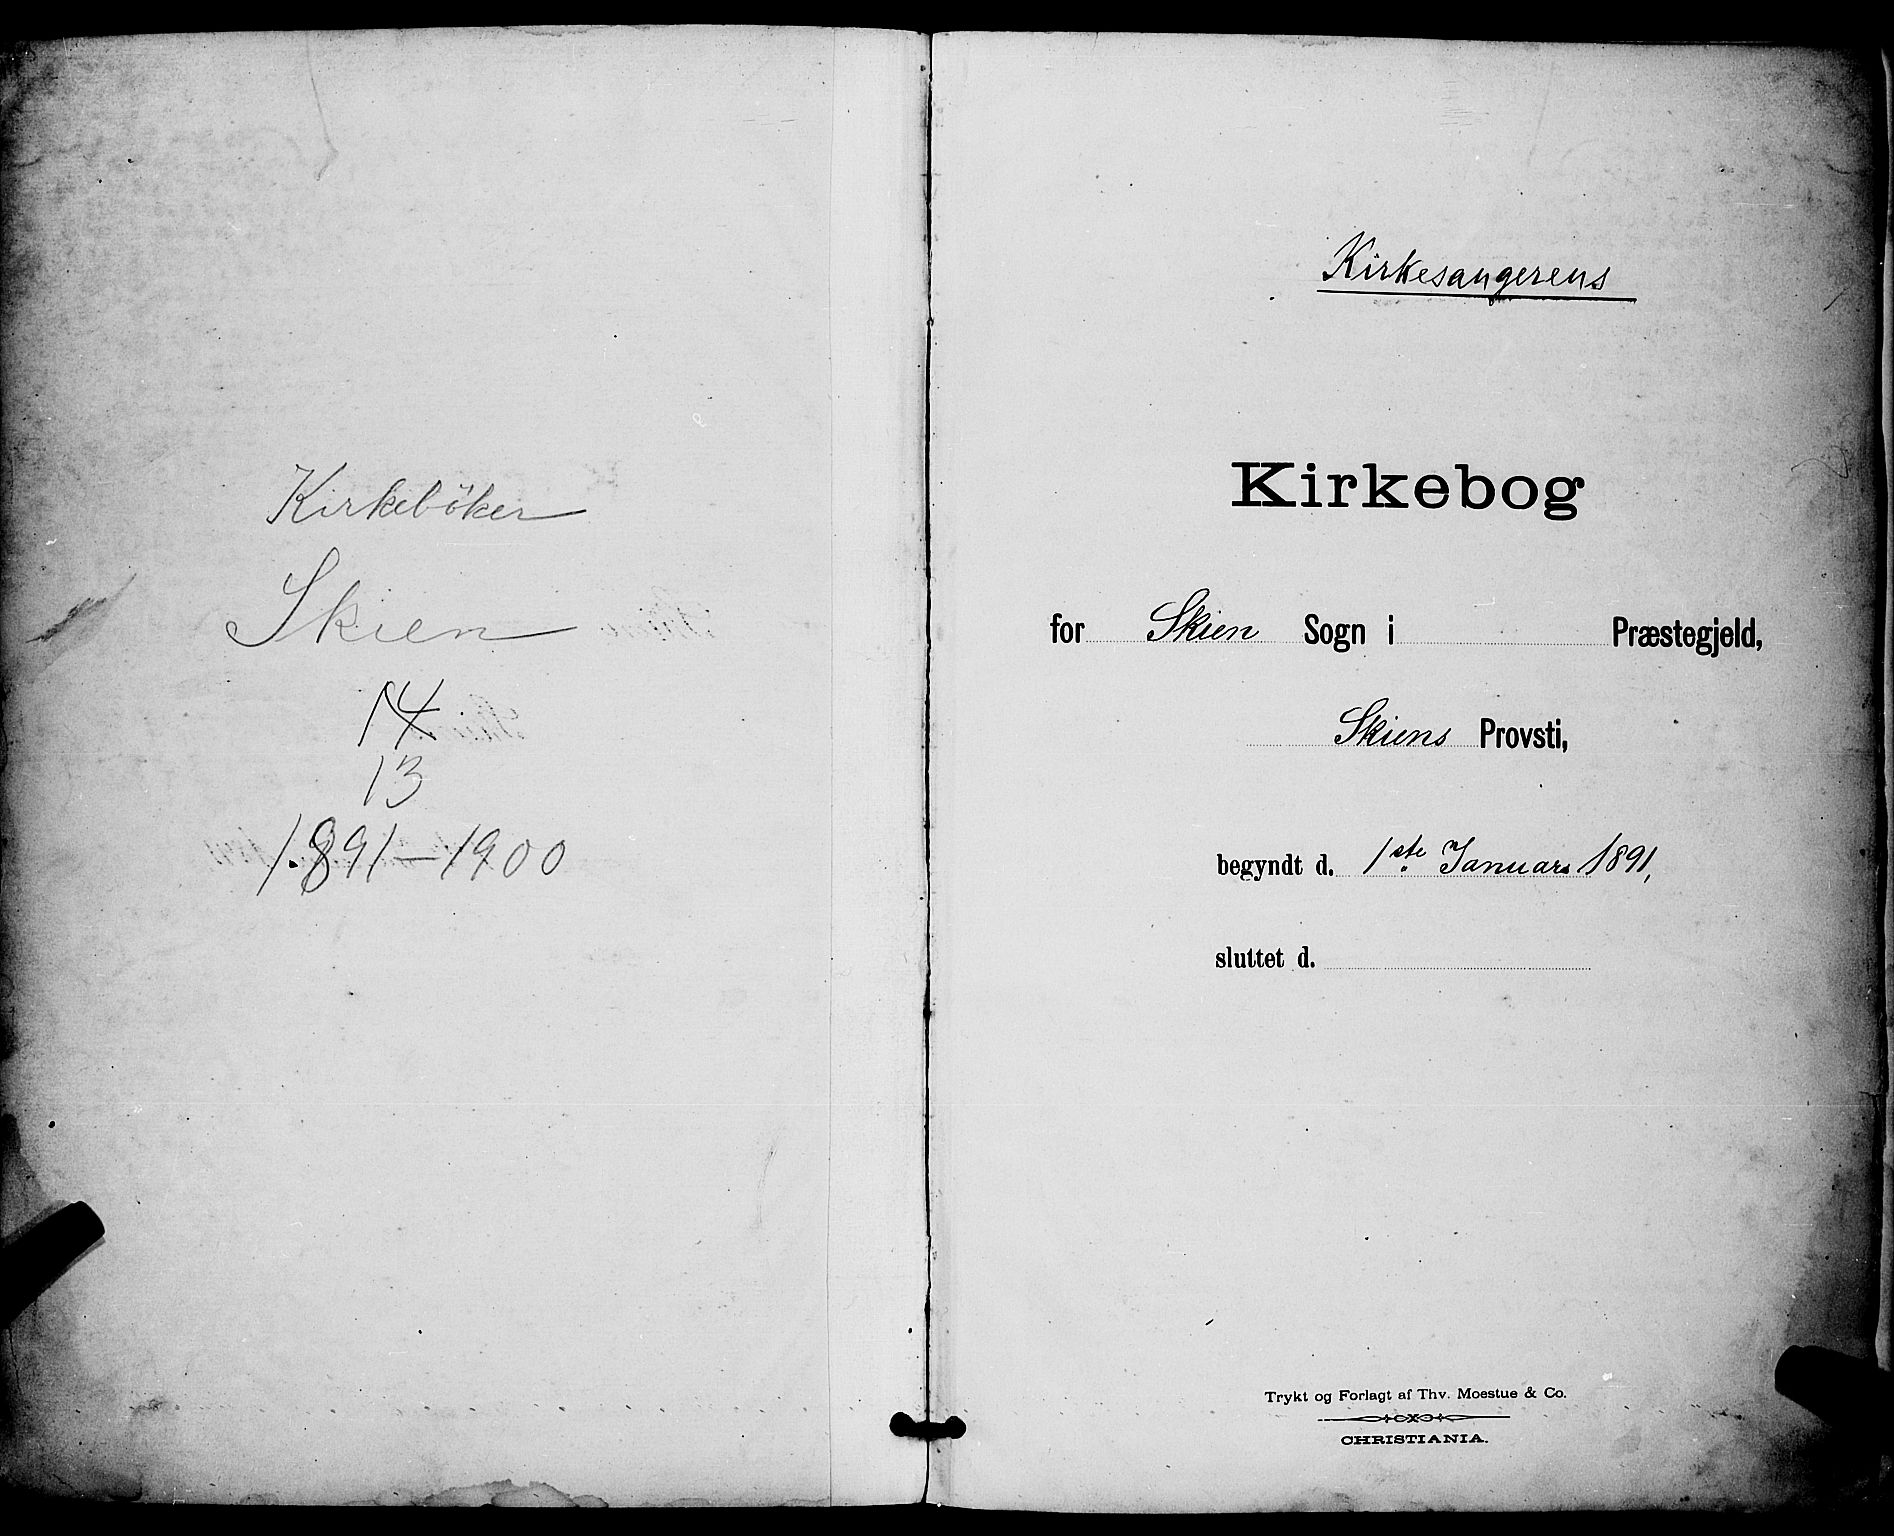 SAKO, Skien kirkebøker, G/Ga/L0007: Klokkerbok nr. 7, 1891-1900